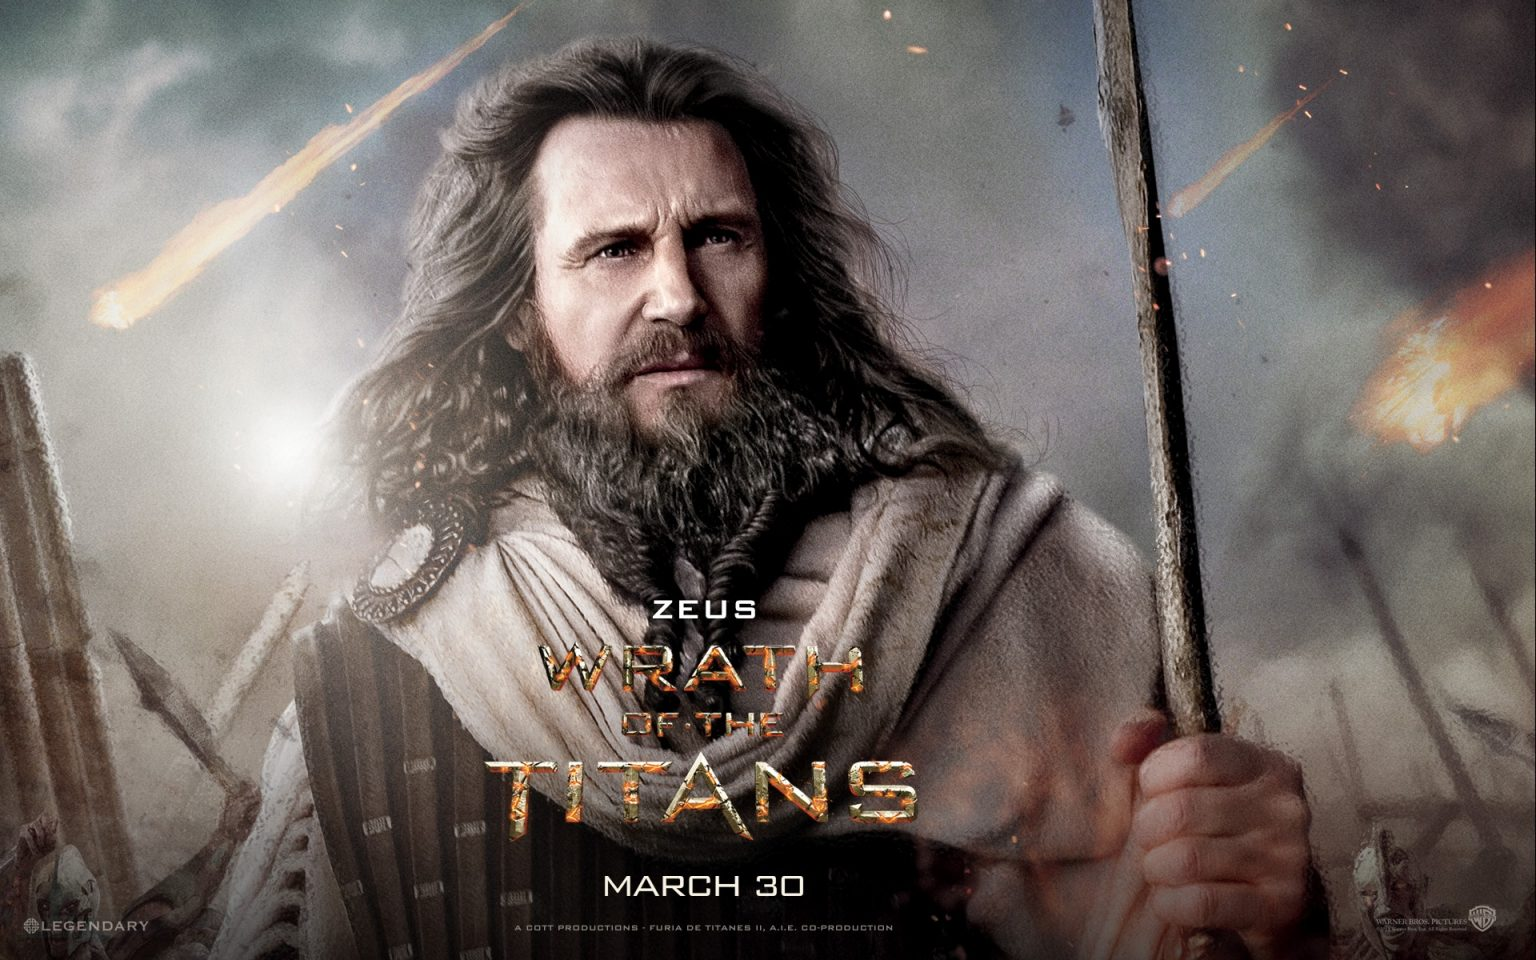 Liam Neeson mong muốn quay lại vai Zeus trong loạt phim Clash of the Titans